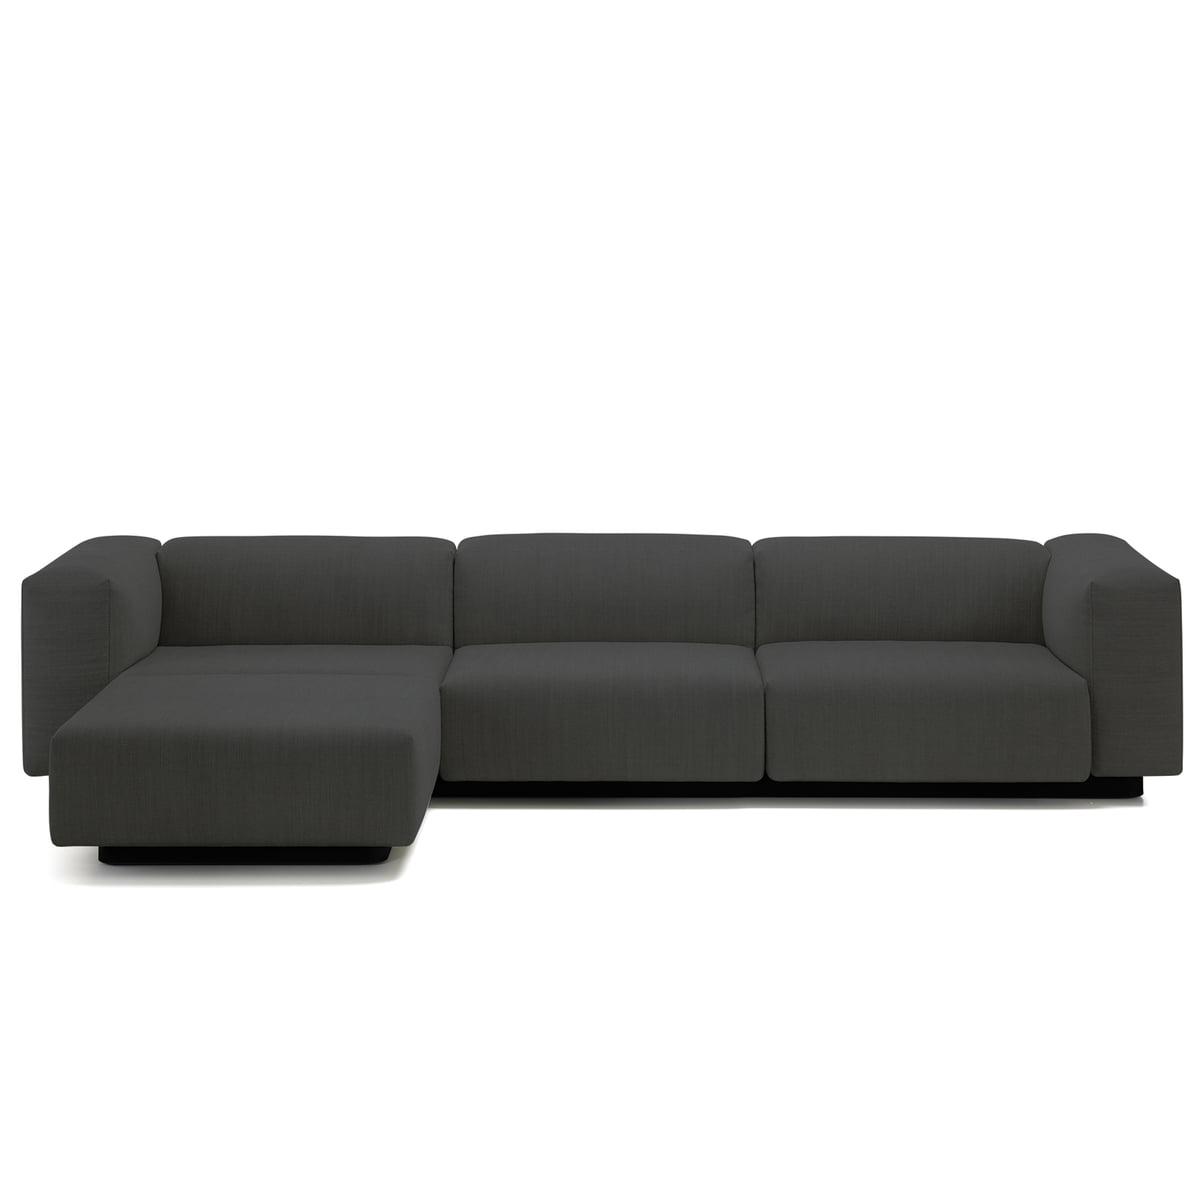 Full Size of Modular Sofa Set Flex Modulares Mit Schlaffunktion Dhel Lennon Westwing System Leder Kissen Ikea Sitzhöhe 55 Cm Kaufen Günstig Rattan Garten Led Elektrisch 3 Sofa Modulares Sofa